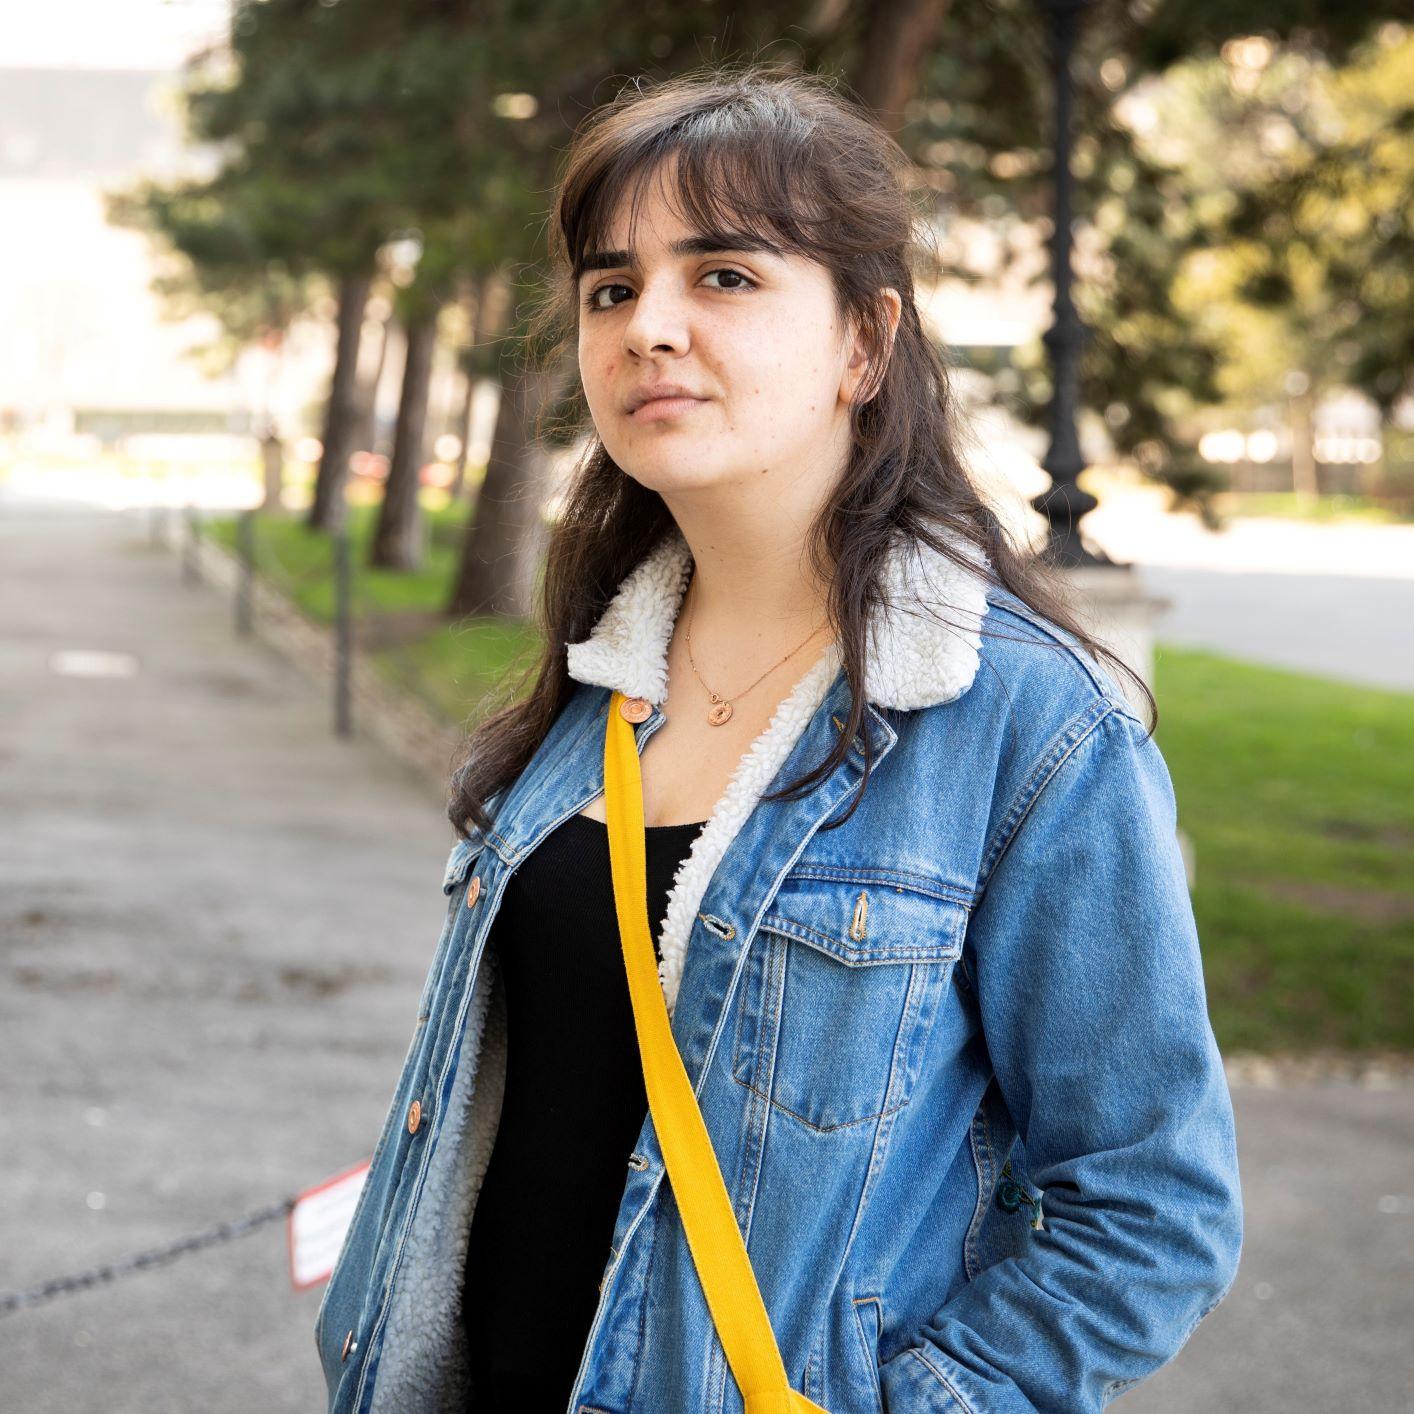 261449 Rania AUT EuropawahlKampagne C AmnestyInternational 1 1 small